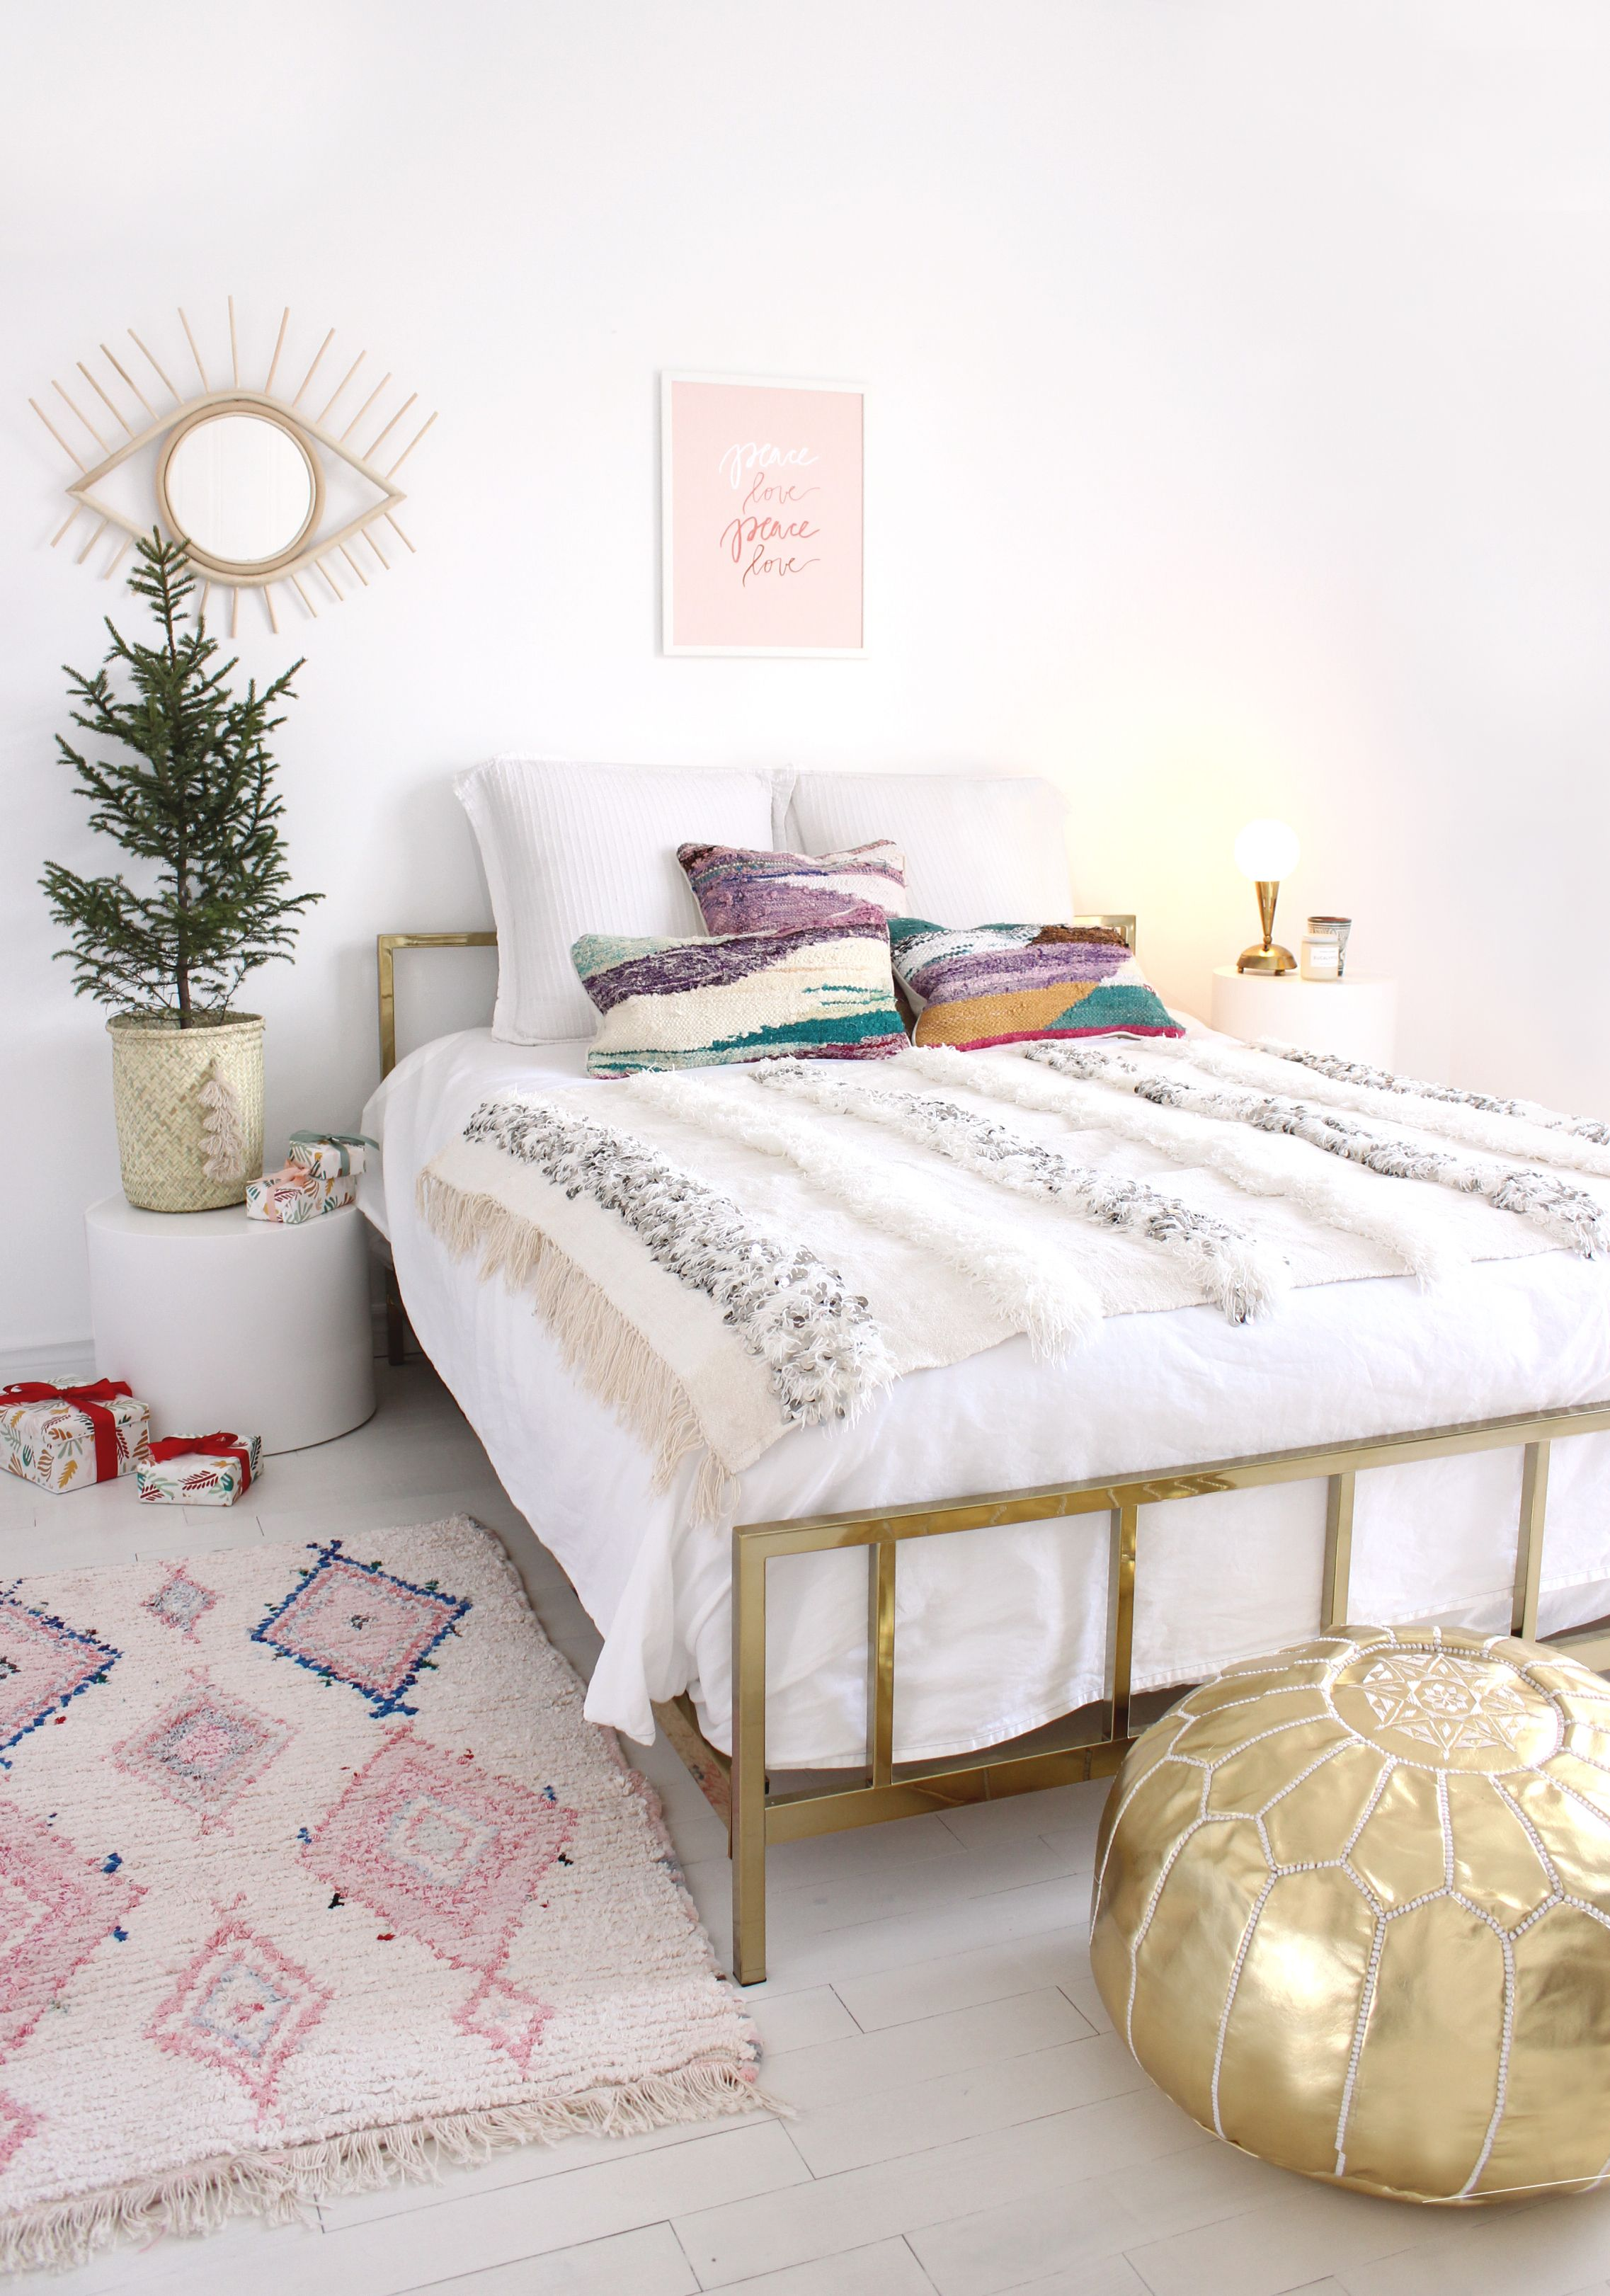 Modern Boho bedroom by Baba Souk | Home decor bedroom ... on Modern Bohemian Bedroom Decor  id=17372